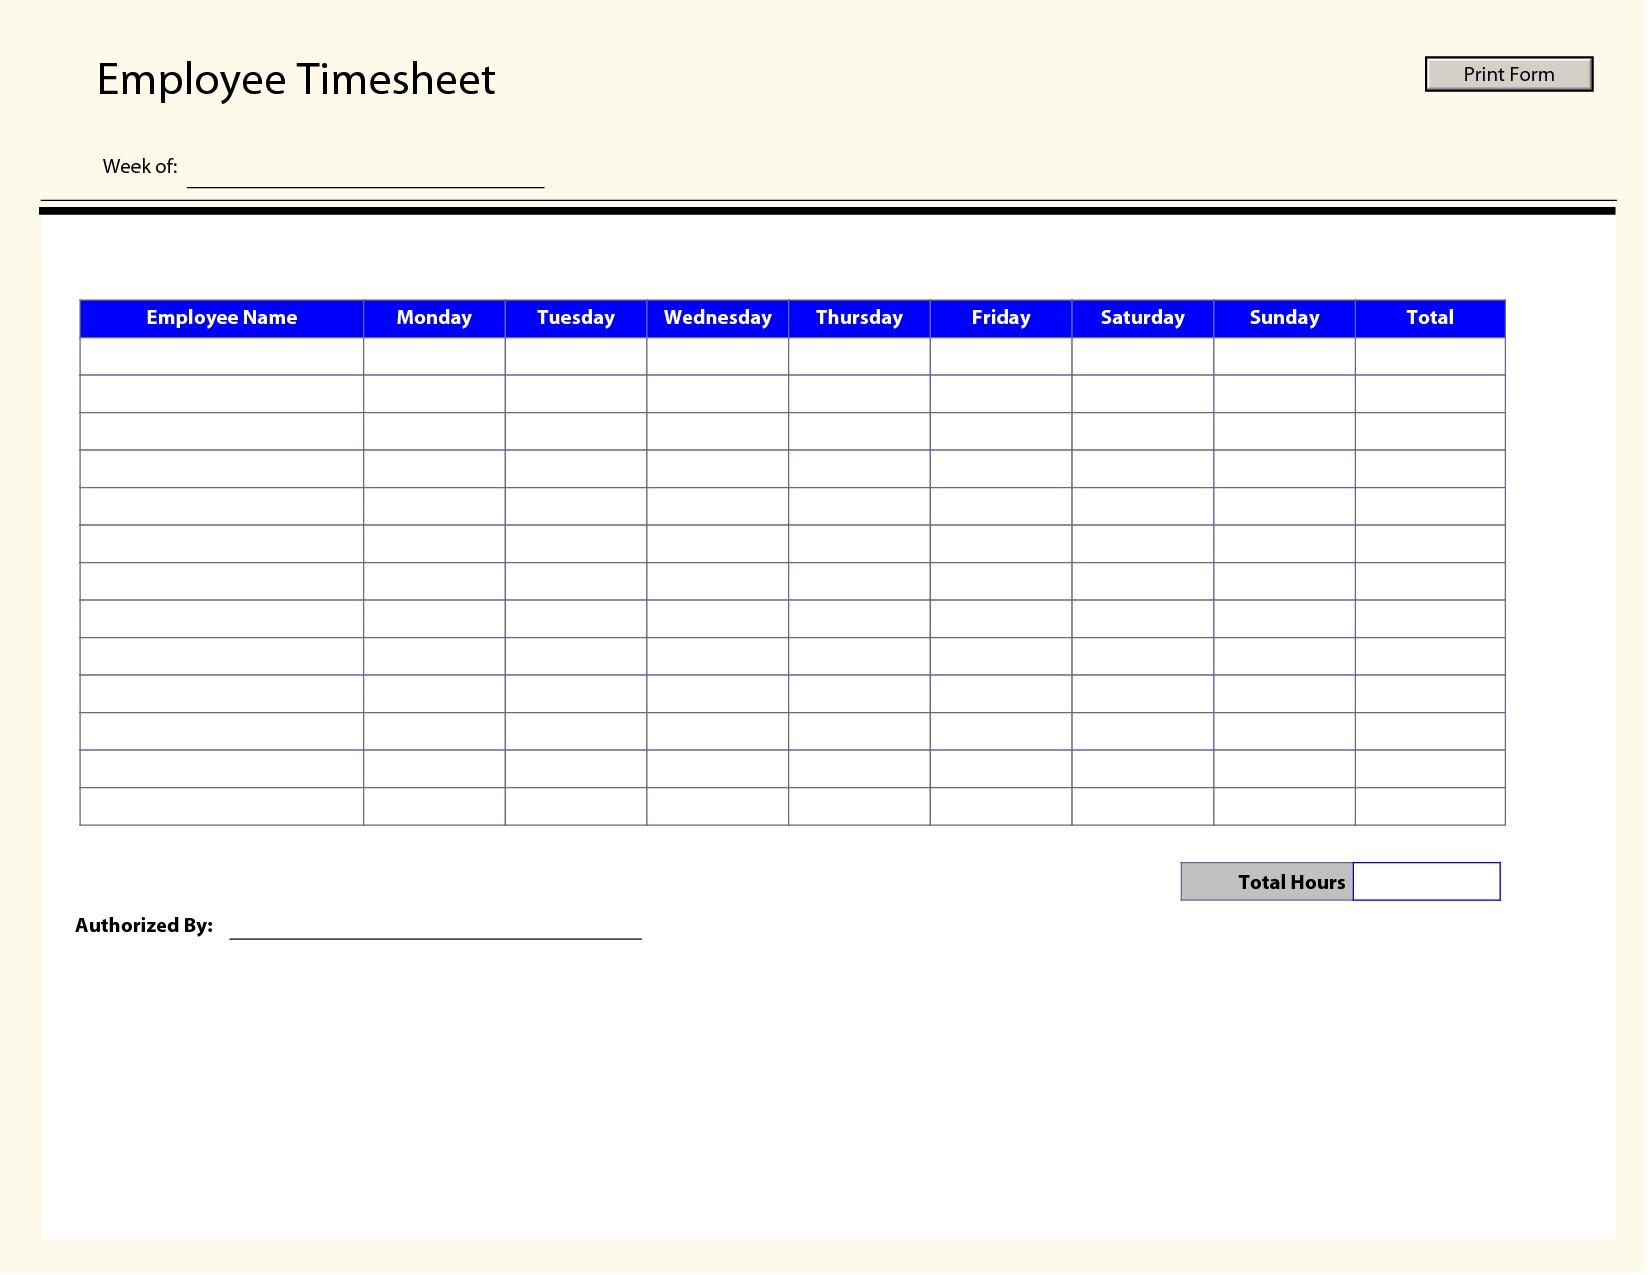 Timesheet Template Free Printable   Rota Template - Free Printable Time Cards